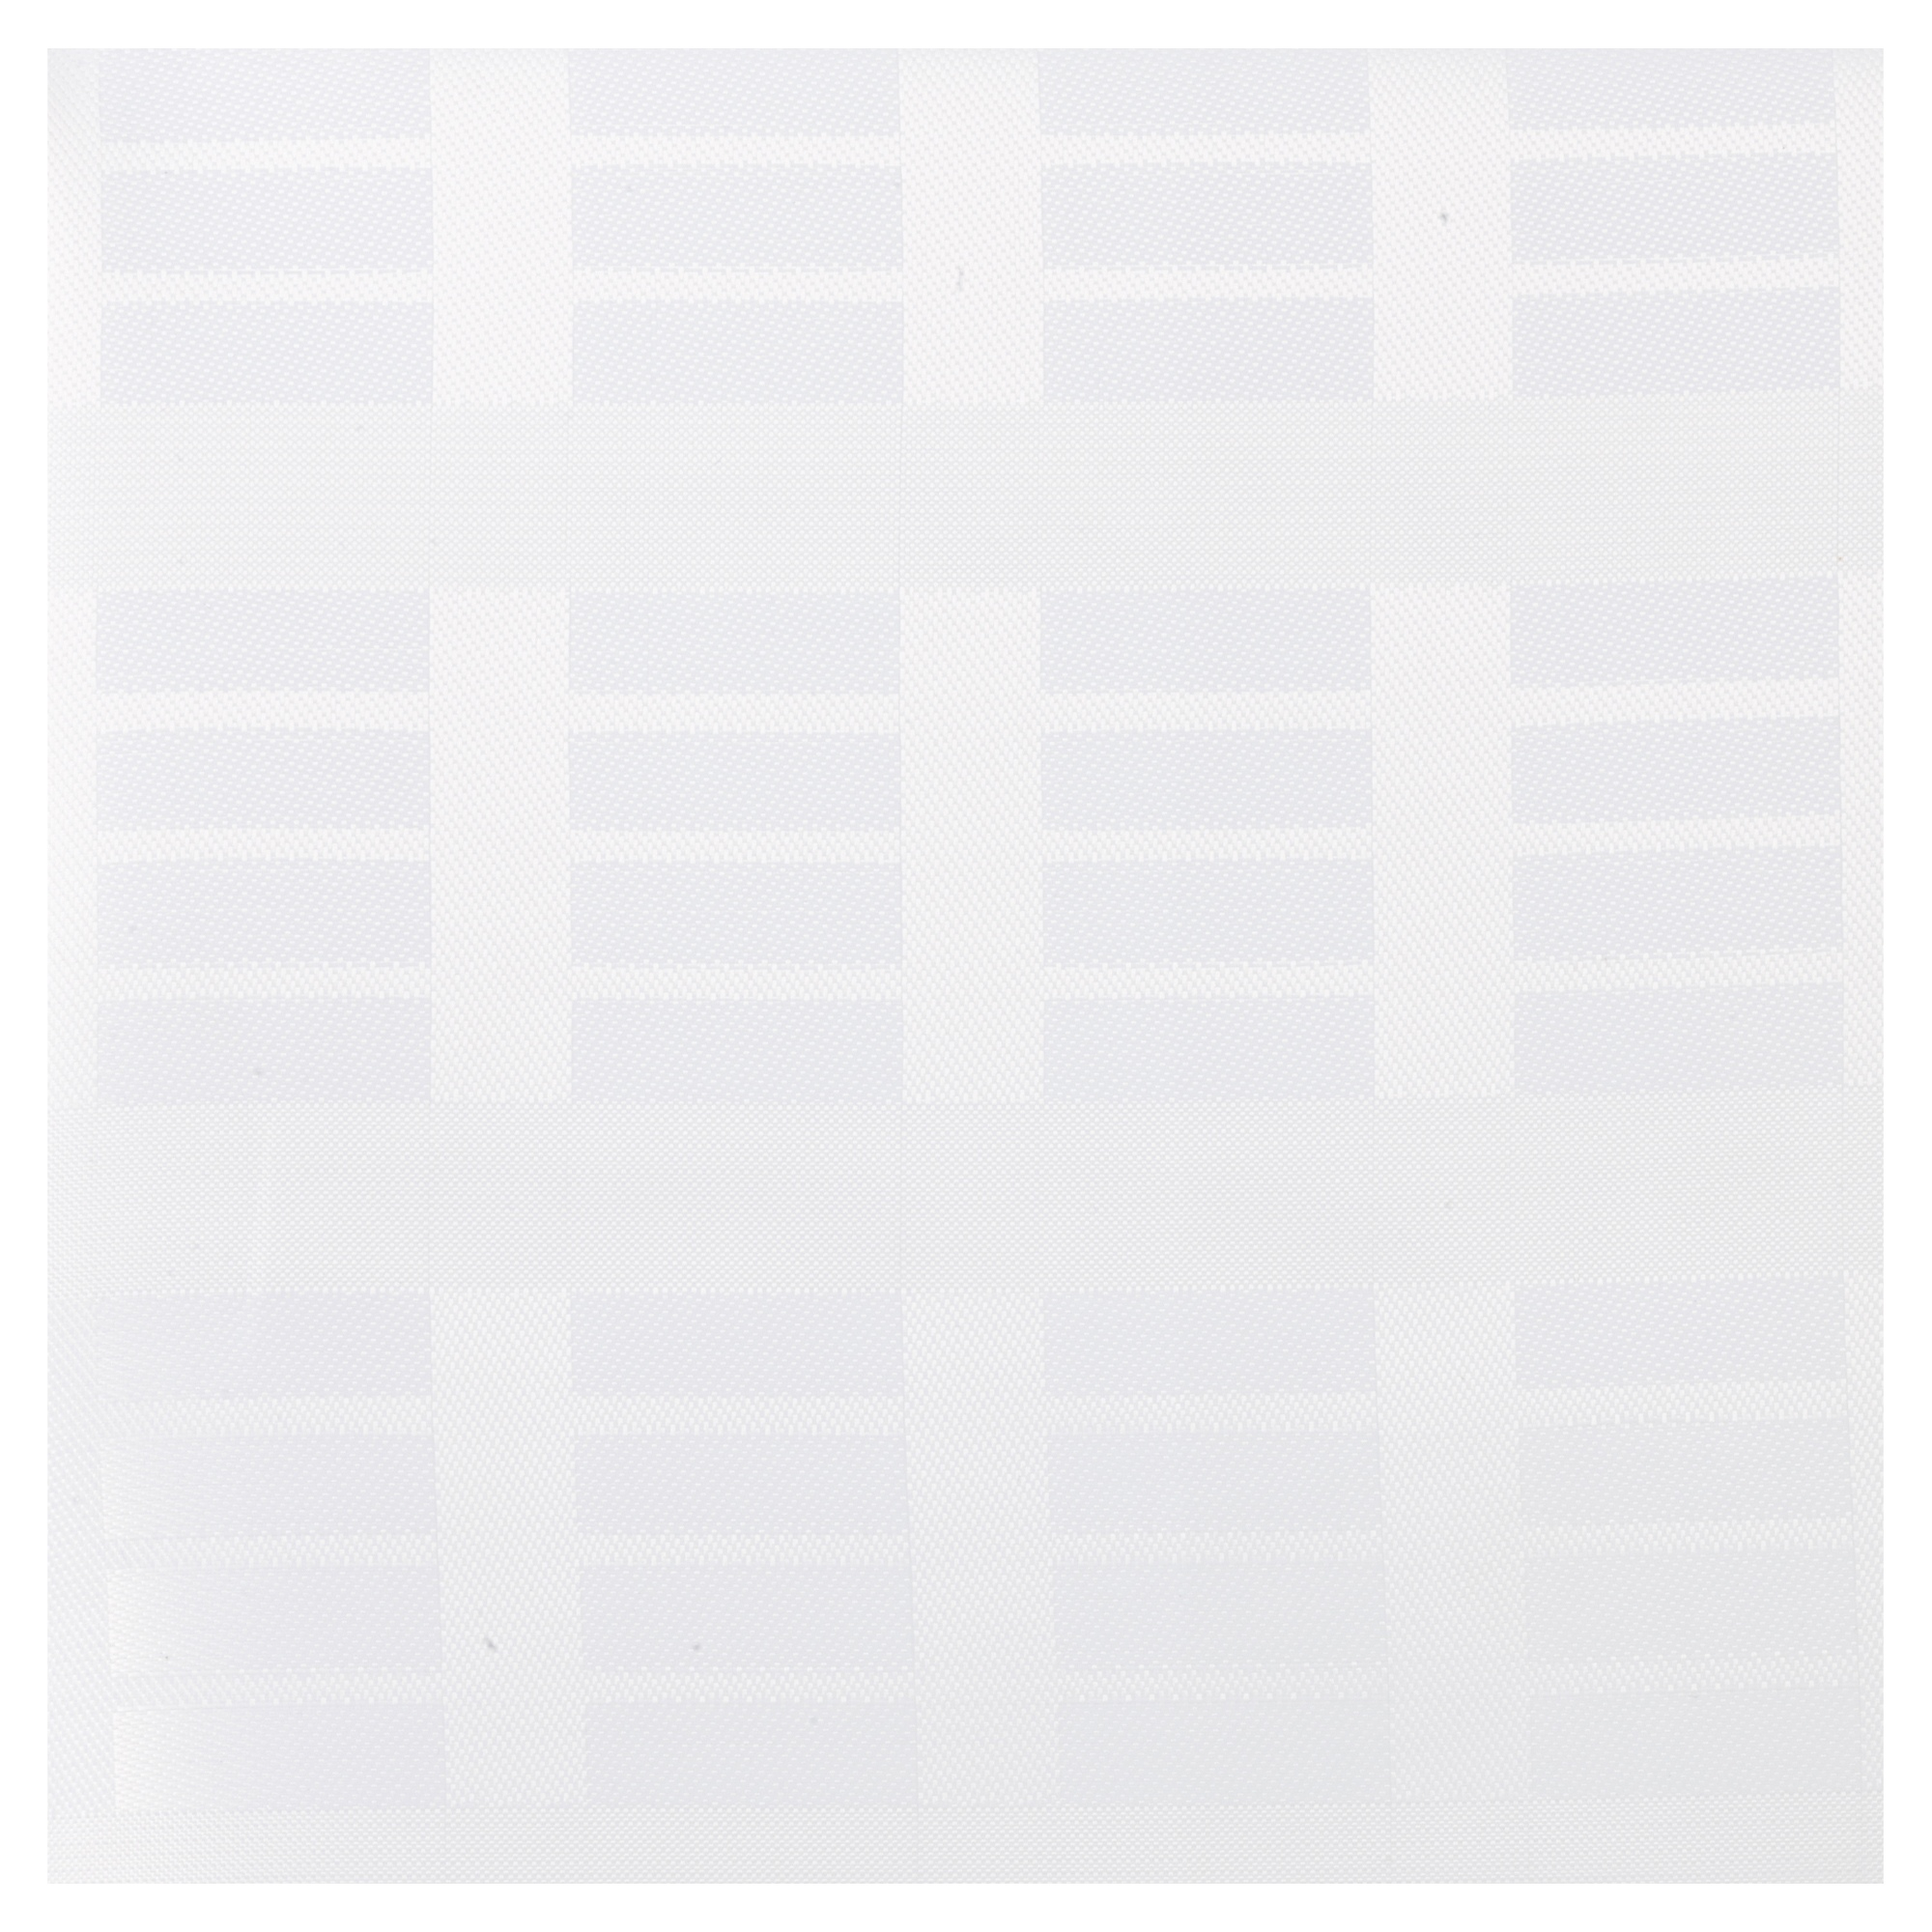 White Shower Bath Curtain Cover Fabric 12 Ring Hooks 180 X 180cm Waterproof Ebay